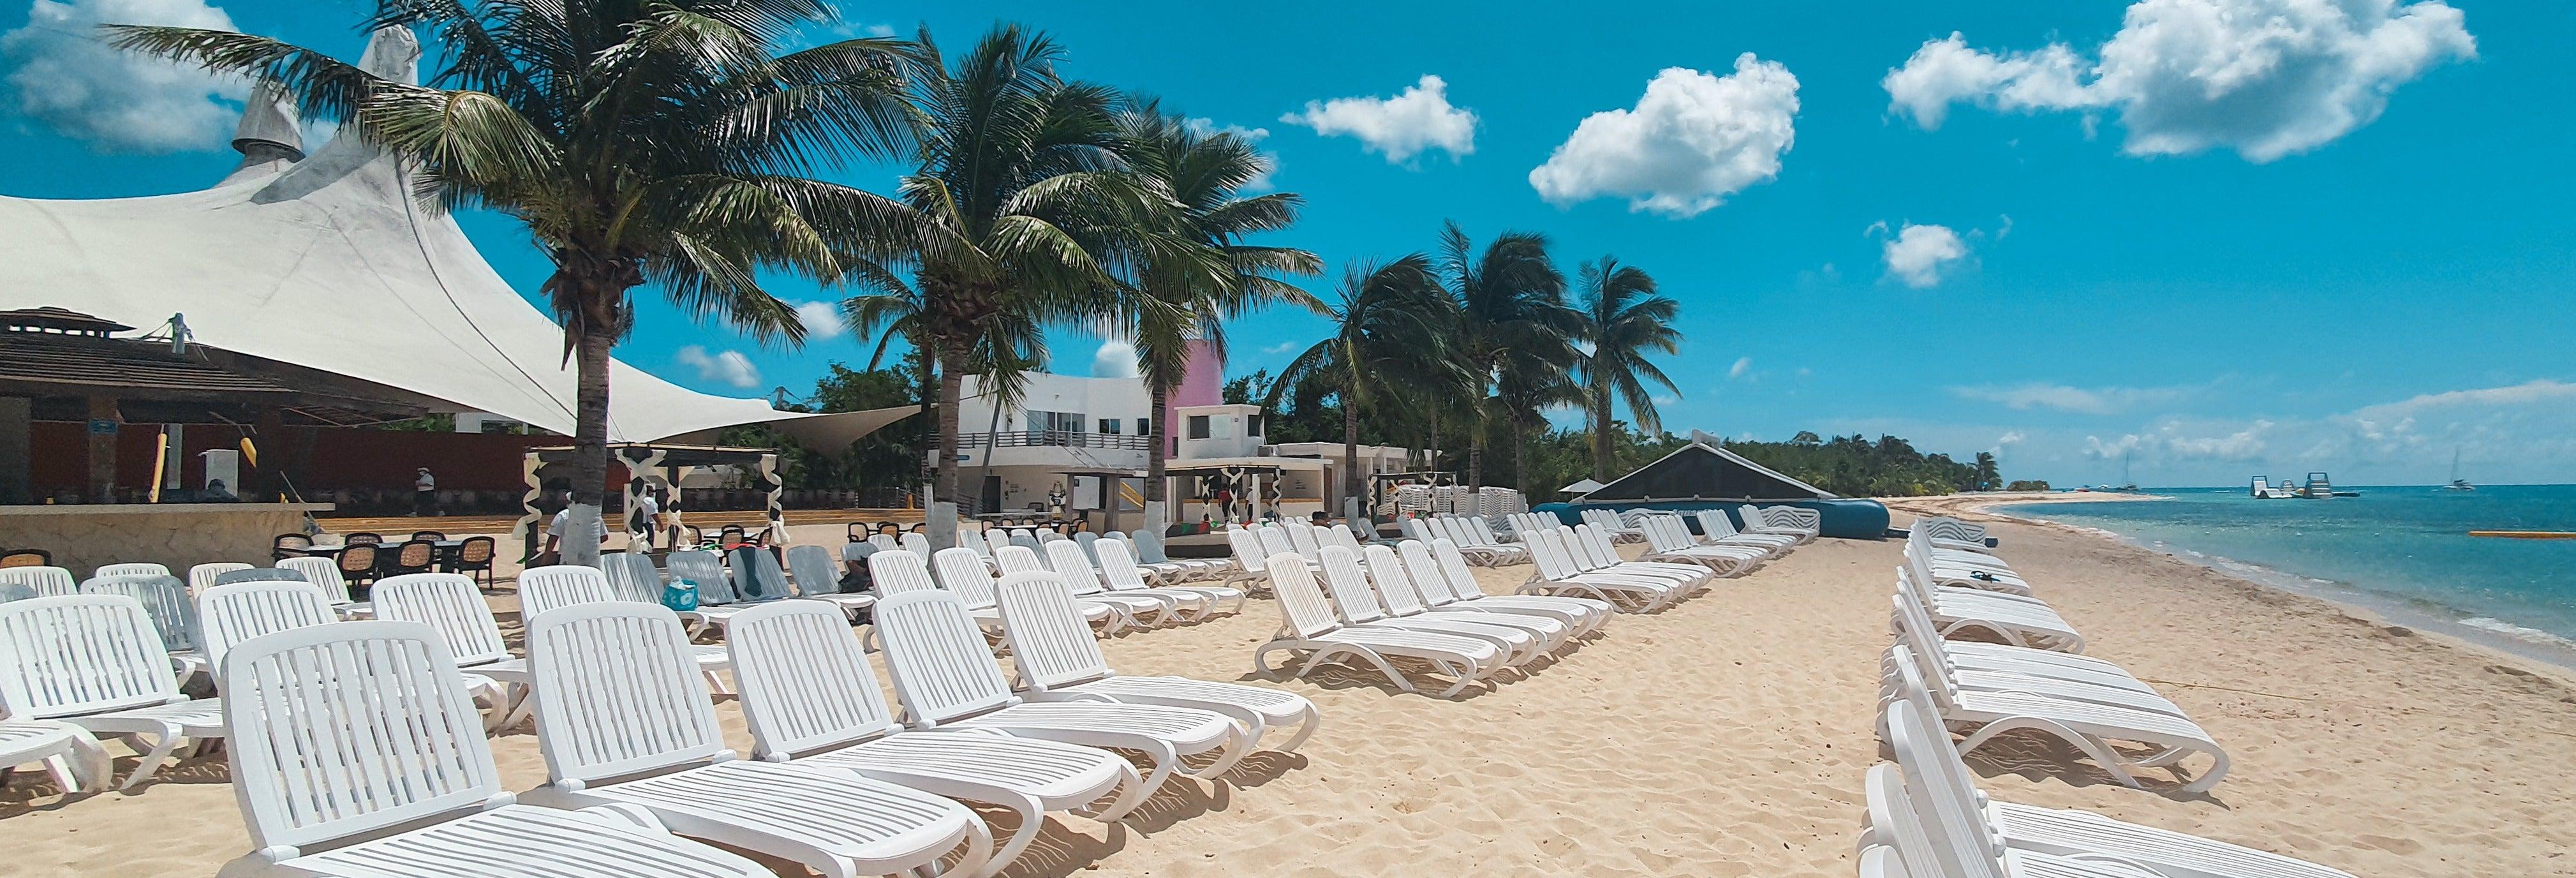 Cozumel Beach Club Day Pass